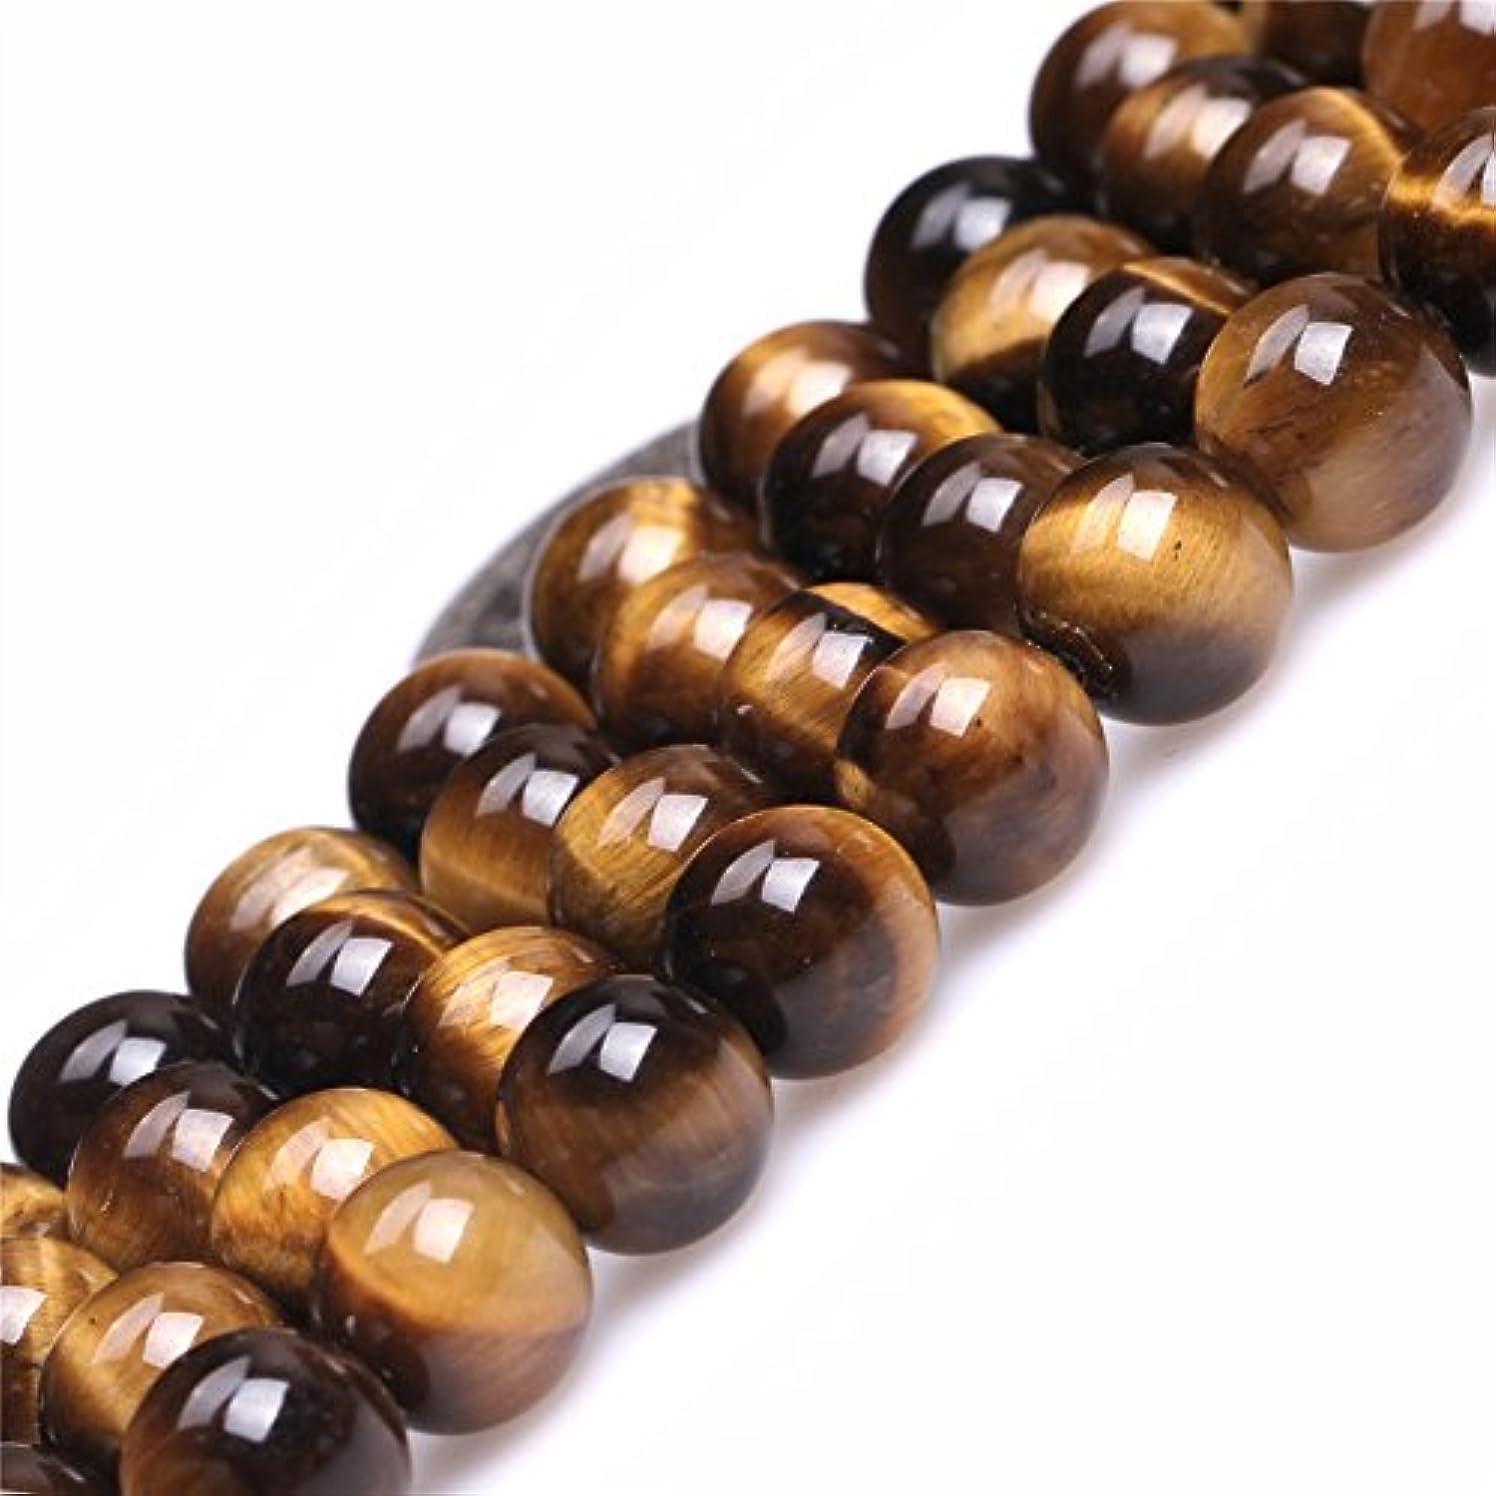 JOE FOREMAN 8mm Tiger Eye Semi Precious Gemstone Round Loose Beads for Jewelry Making DIY Handmade Craft Supplies 15